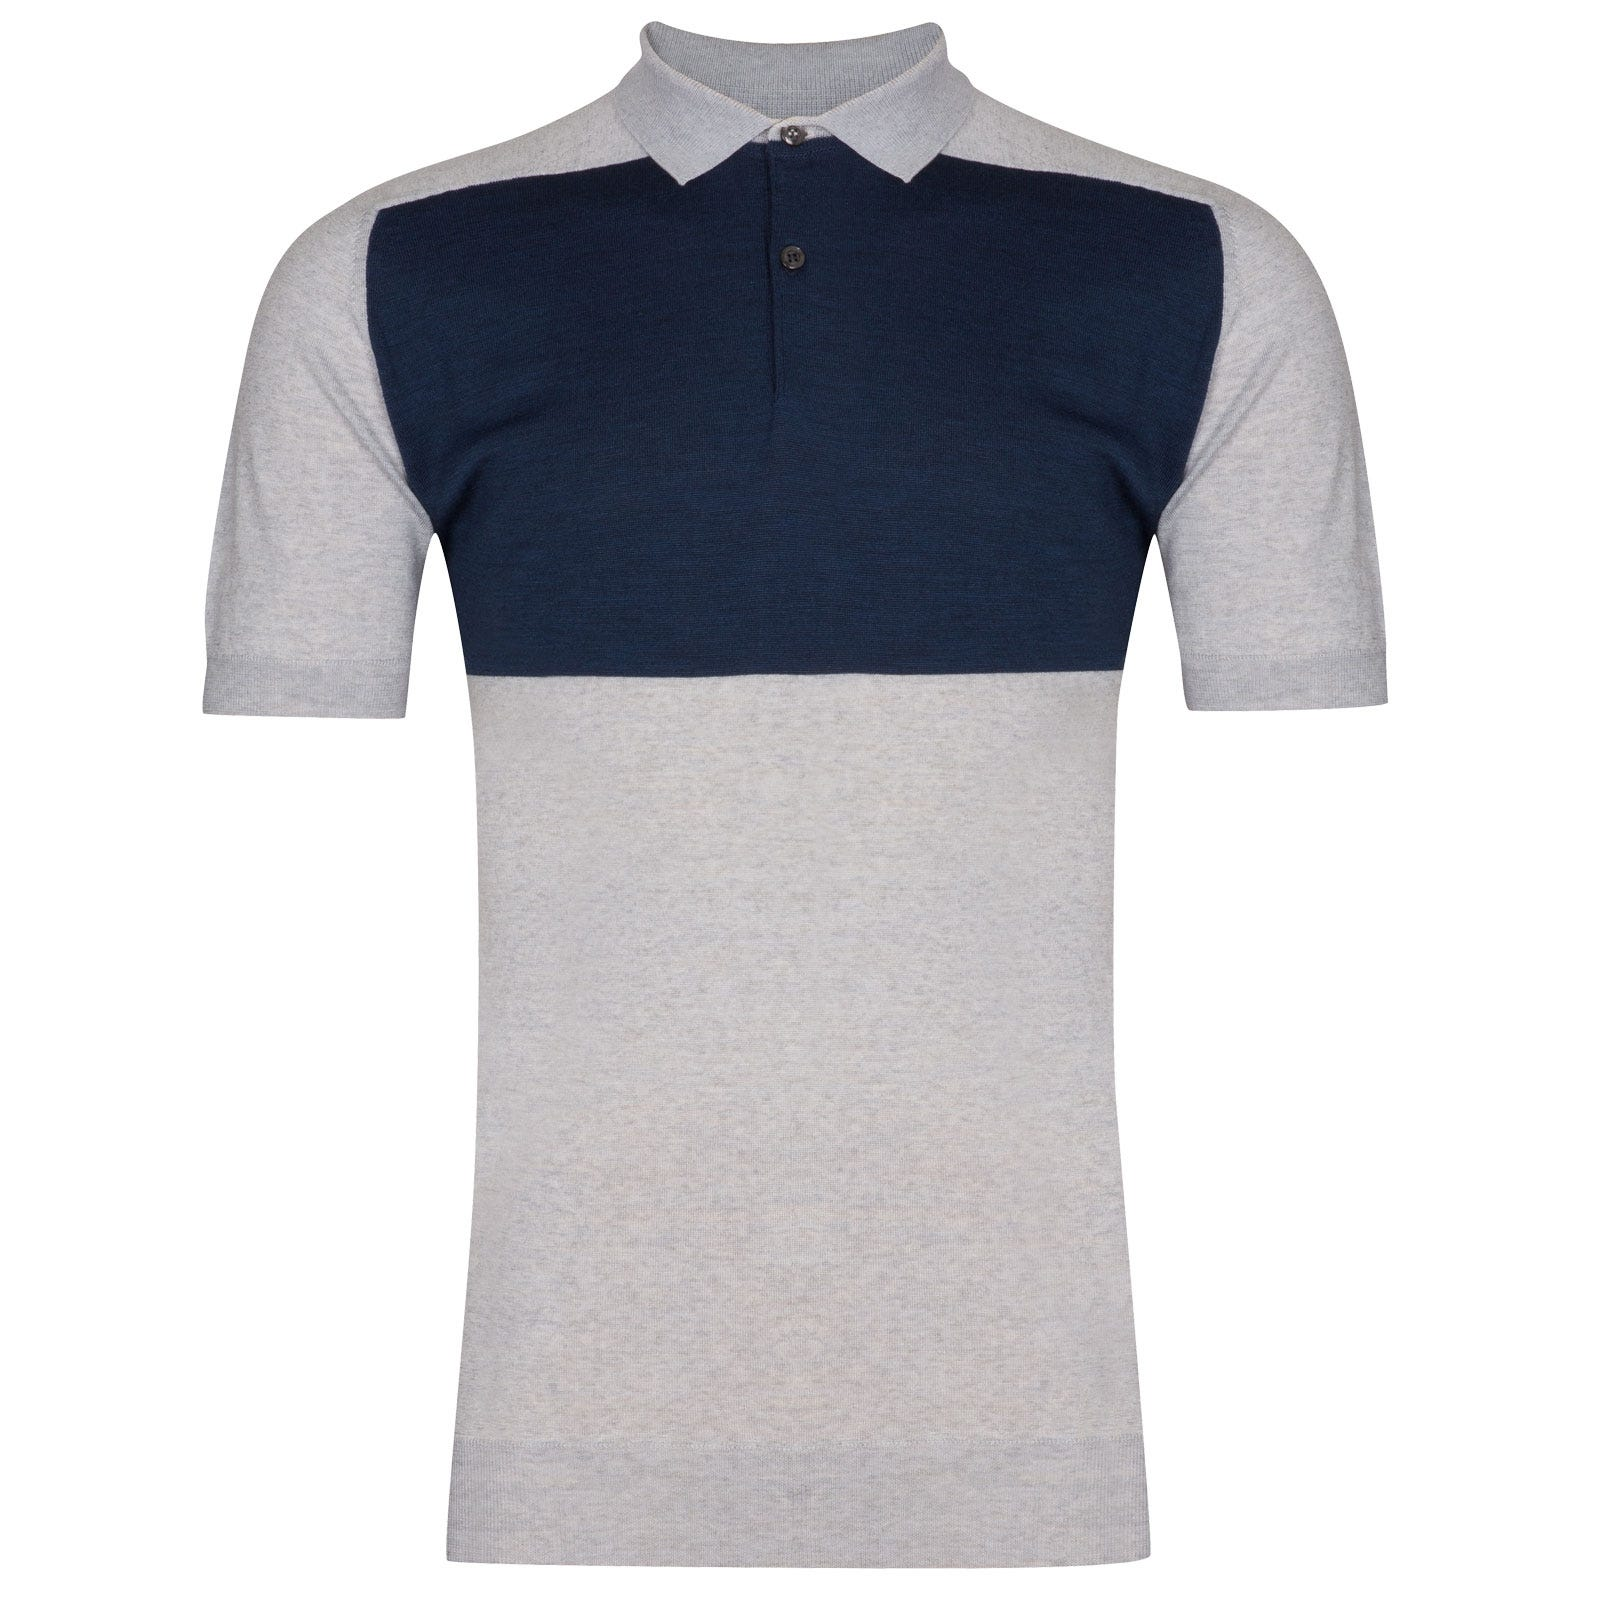 John Smedley Saba in Bardot Grey Shirt-XXL